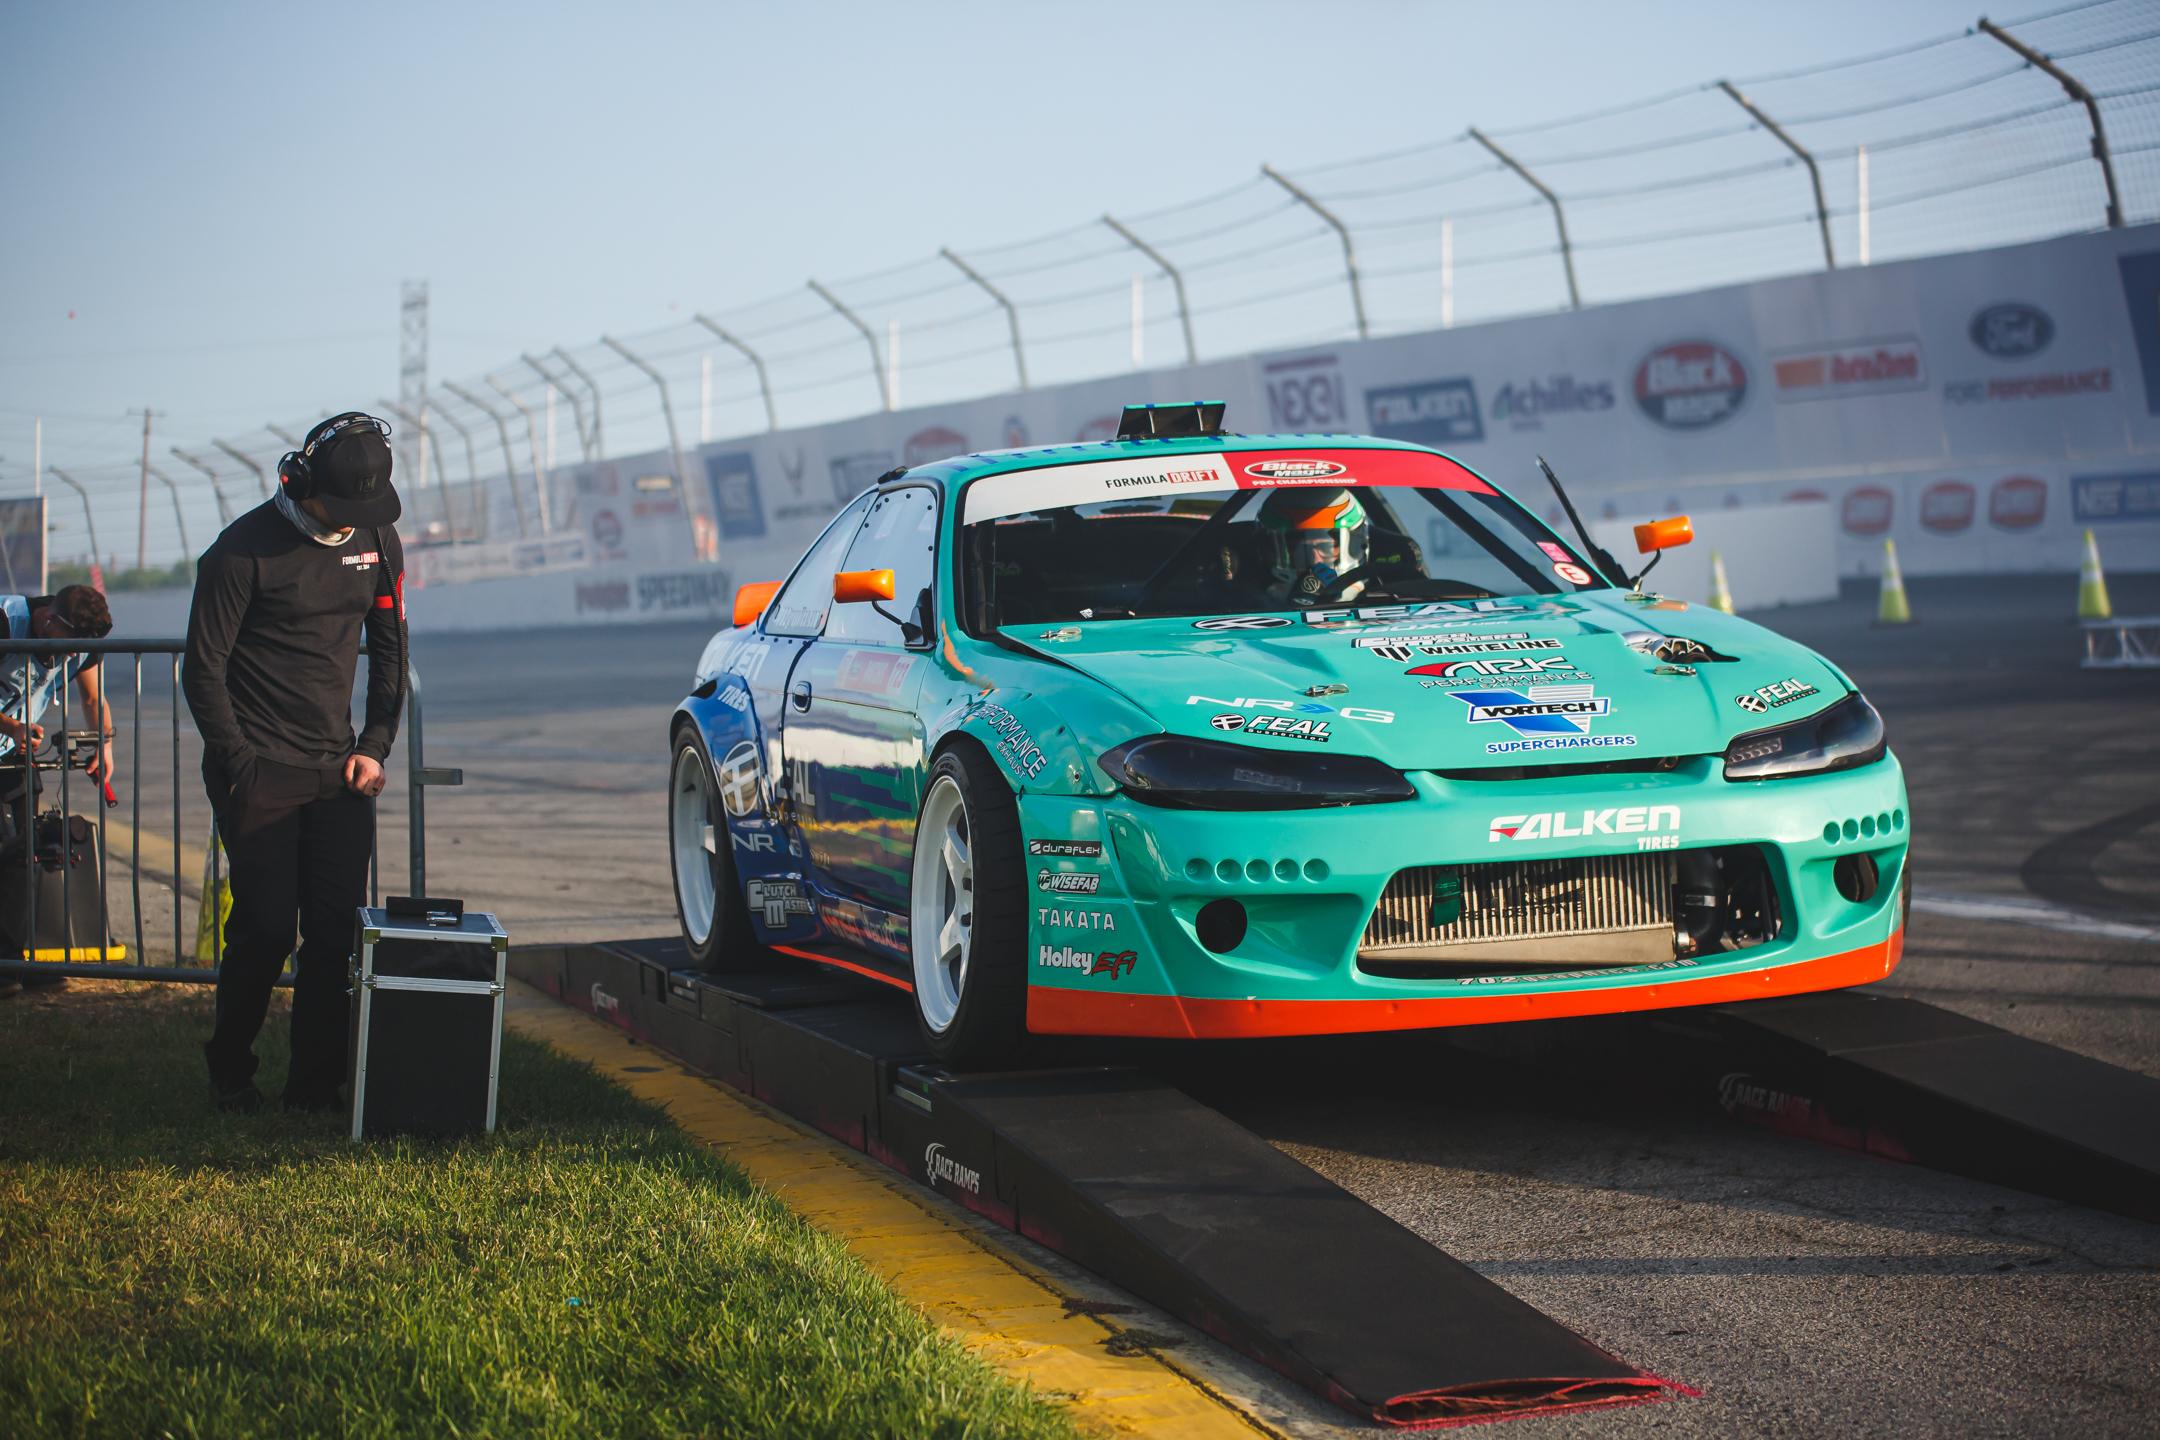 Formula Drift, Formula Drift provides an outlet for automotive passion, ClassicCars.com Journal